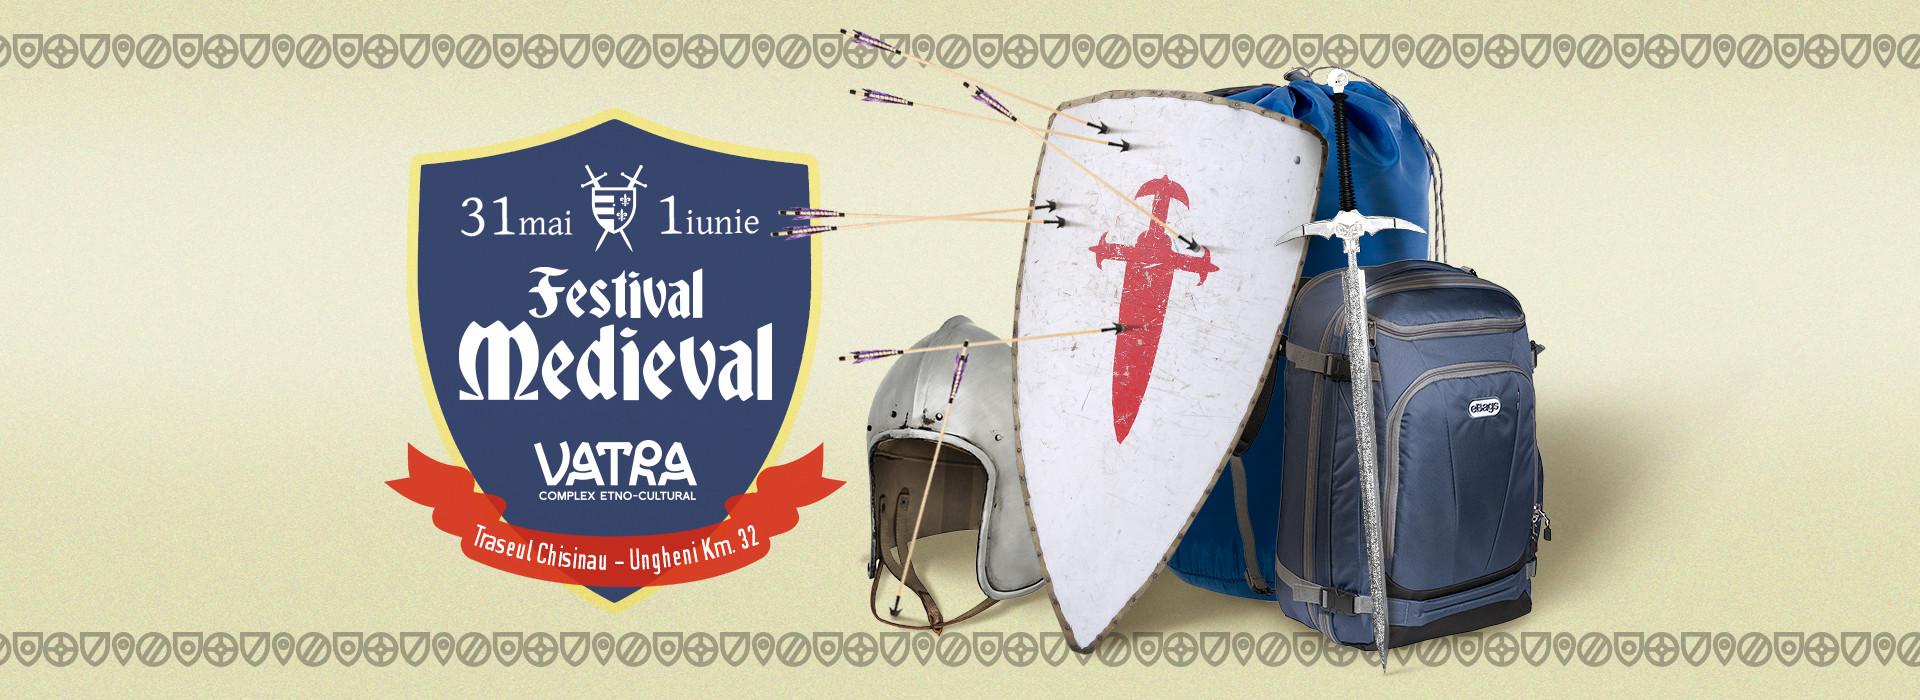 Festival medieval la Vatra